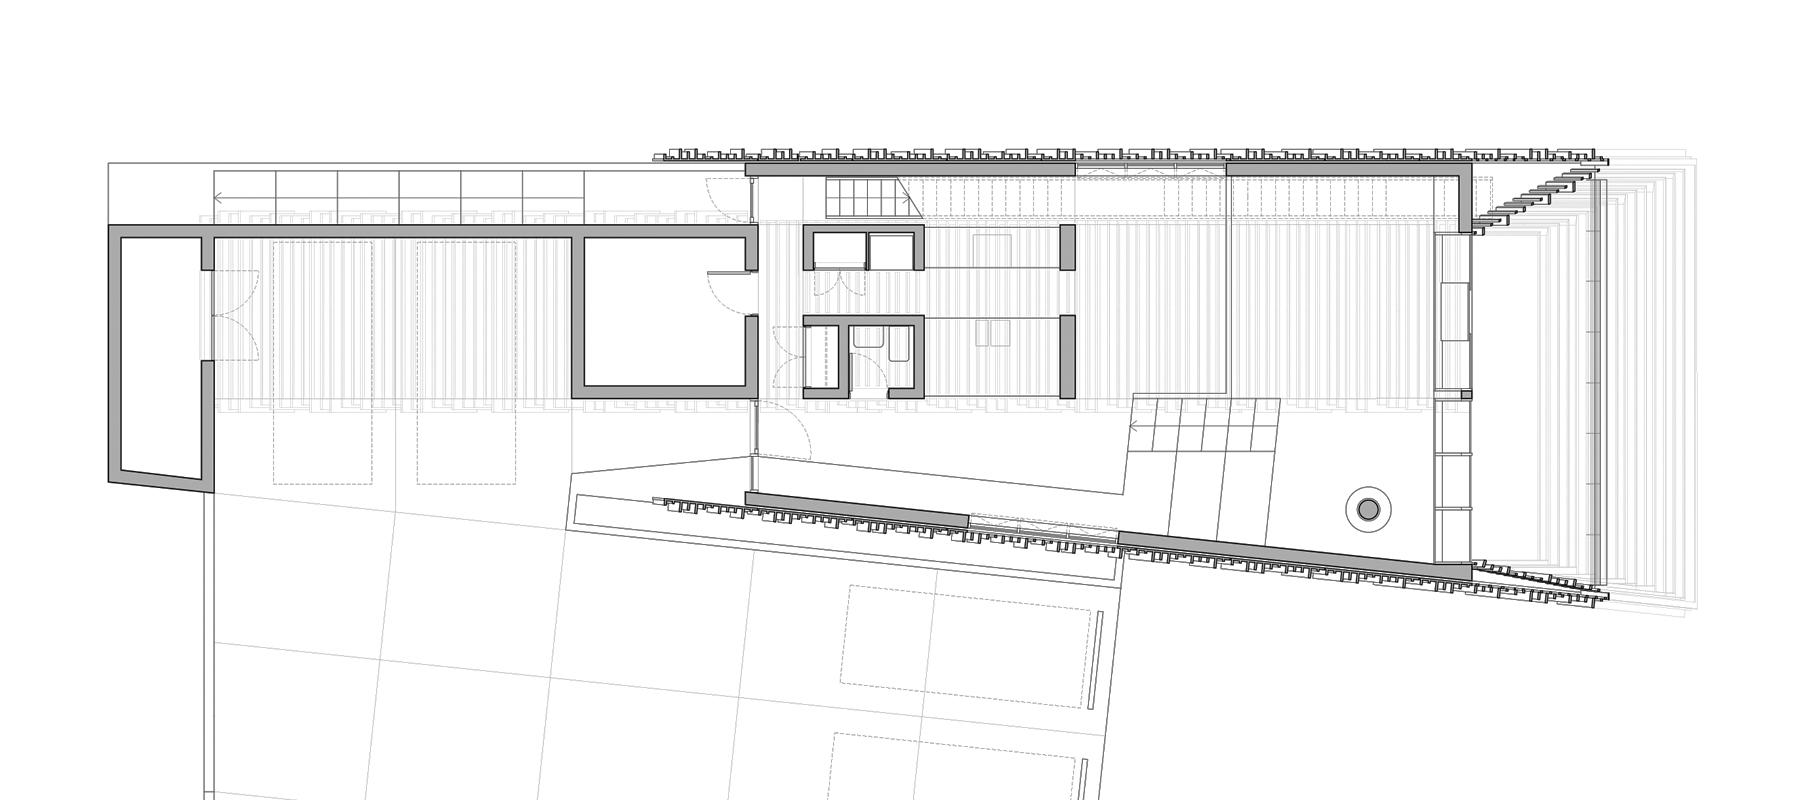 ................ first level floor plan ................